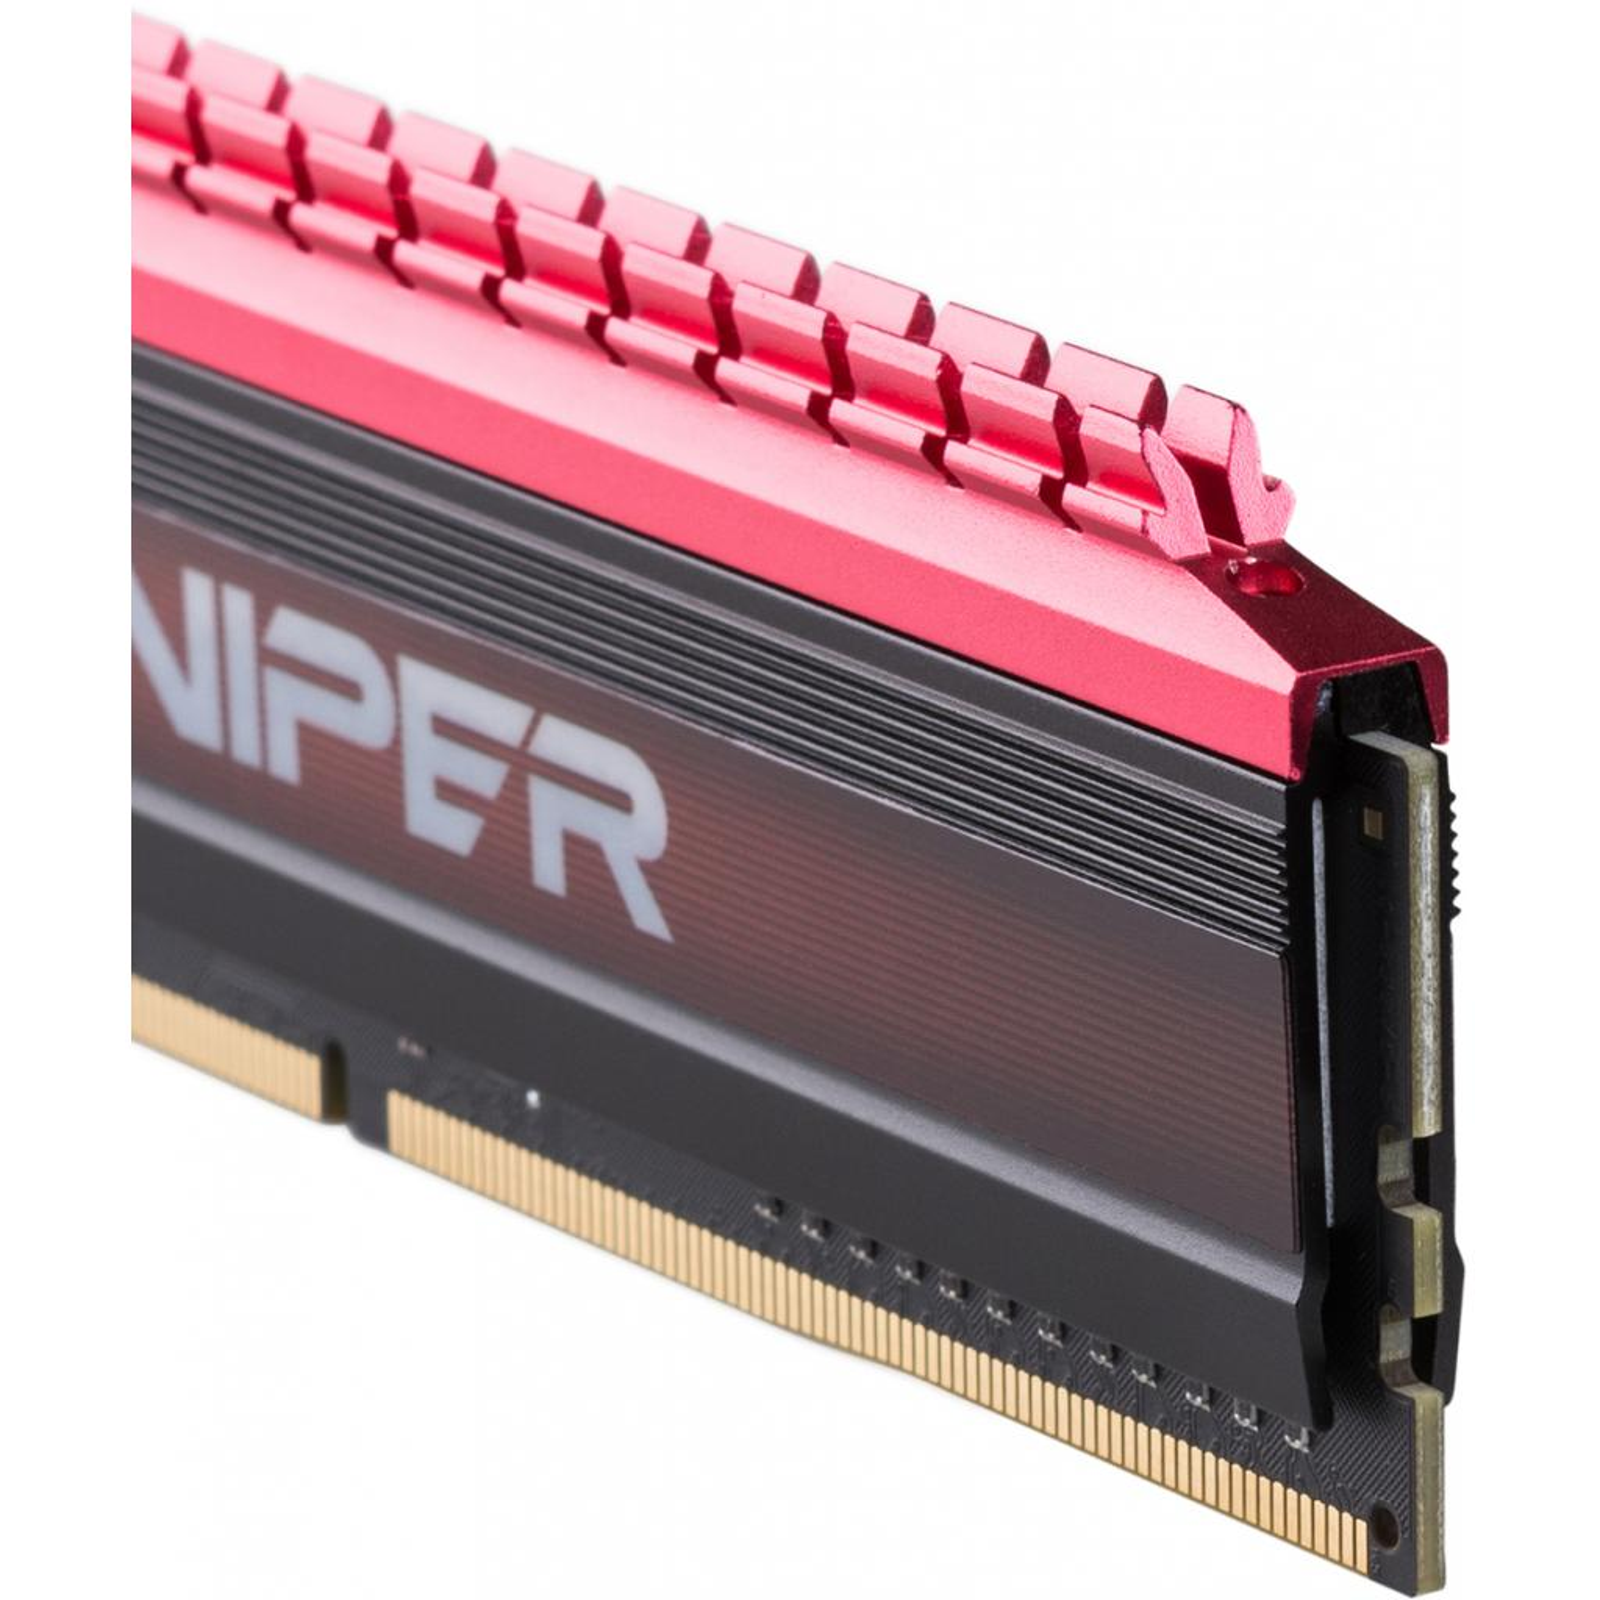 Модуль памяти для компьютера DDR4 16GB (2x8GB) 2666 MHz PE-V4 BLK/RED DUALCH Patriot (PV416G266C5K) изображение 3